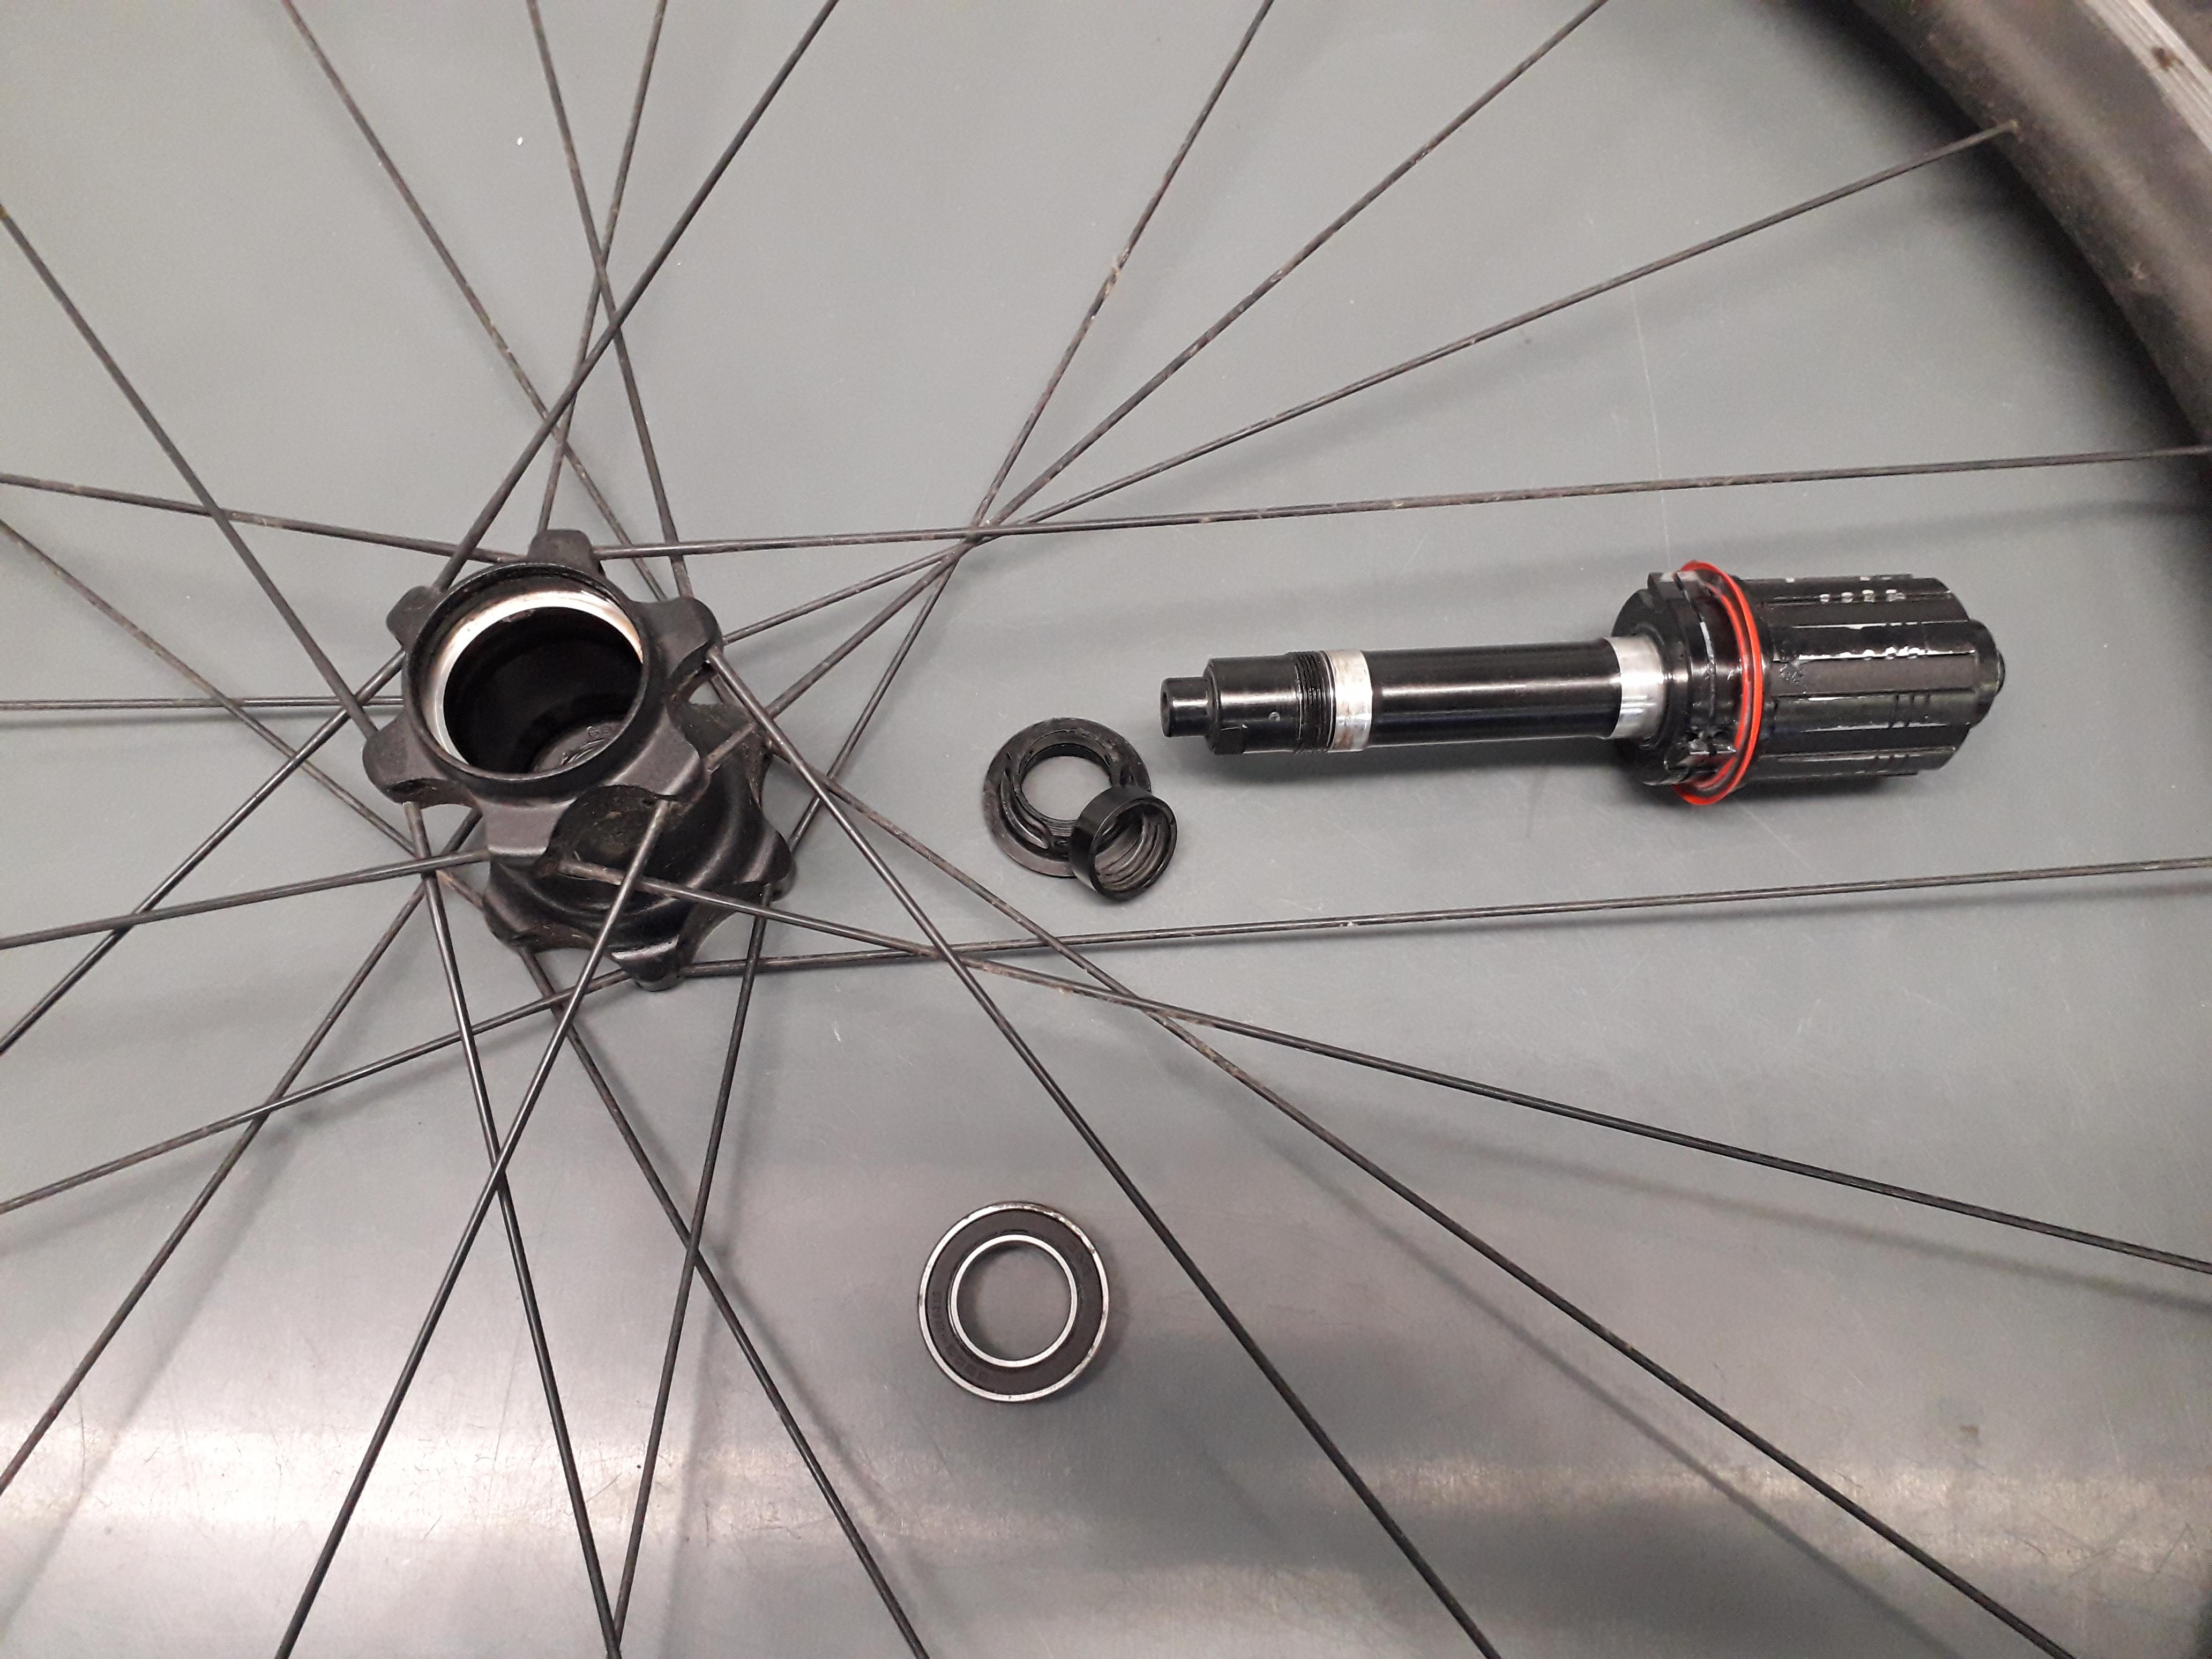 Rear wheel hub stripped down